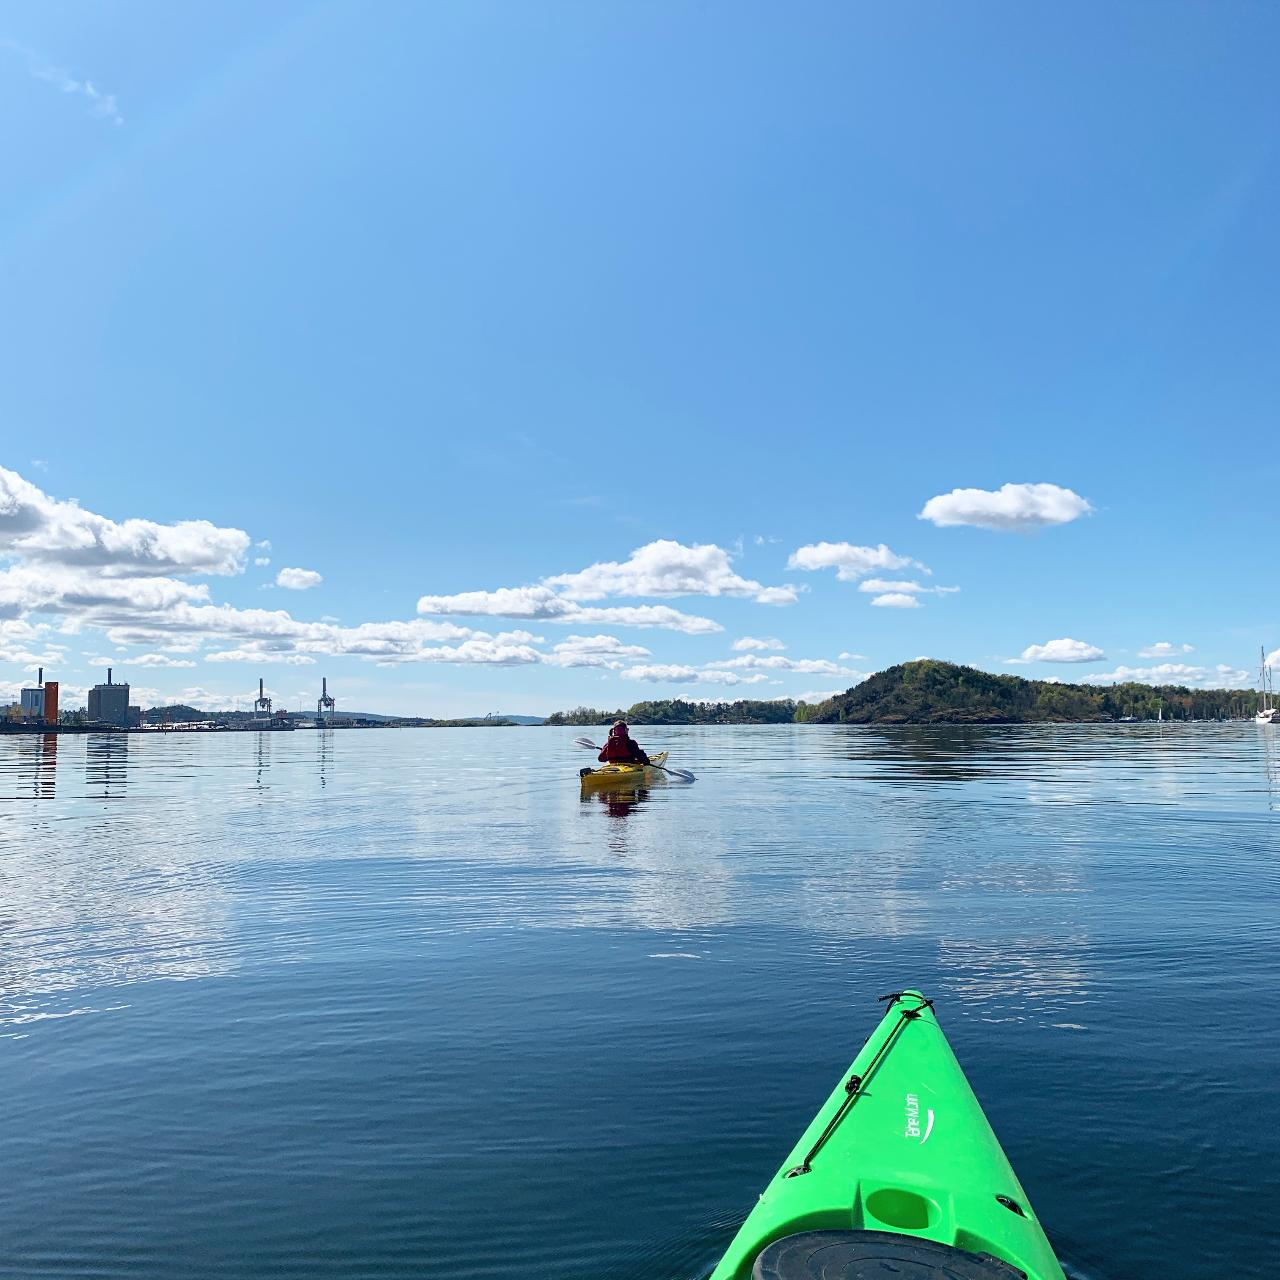 Sea Kayaking - Refresher Course - Lysaker